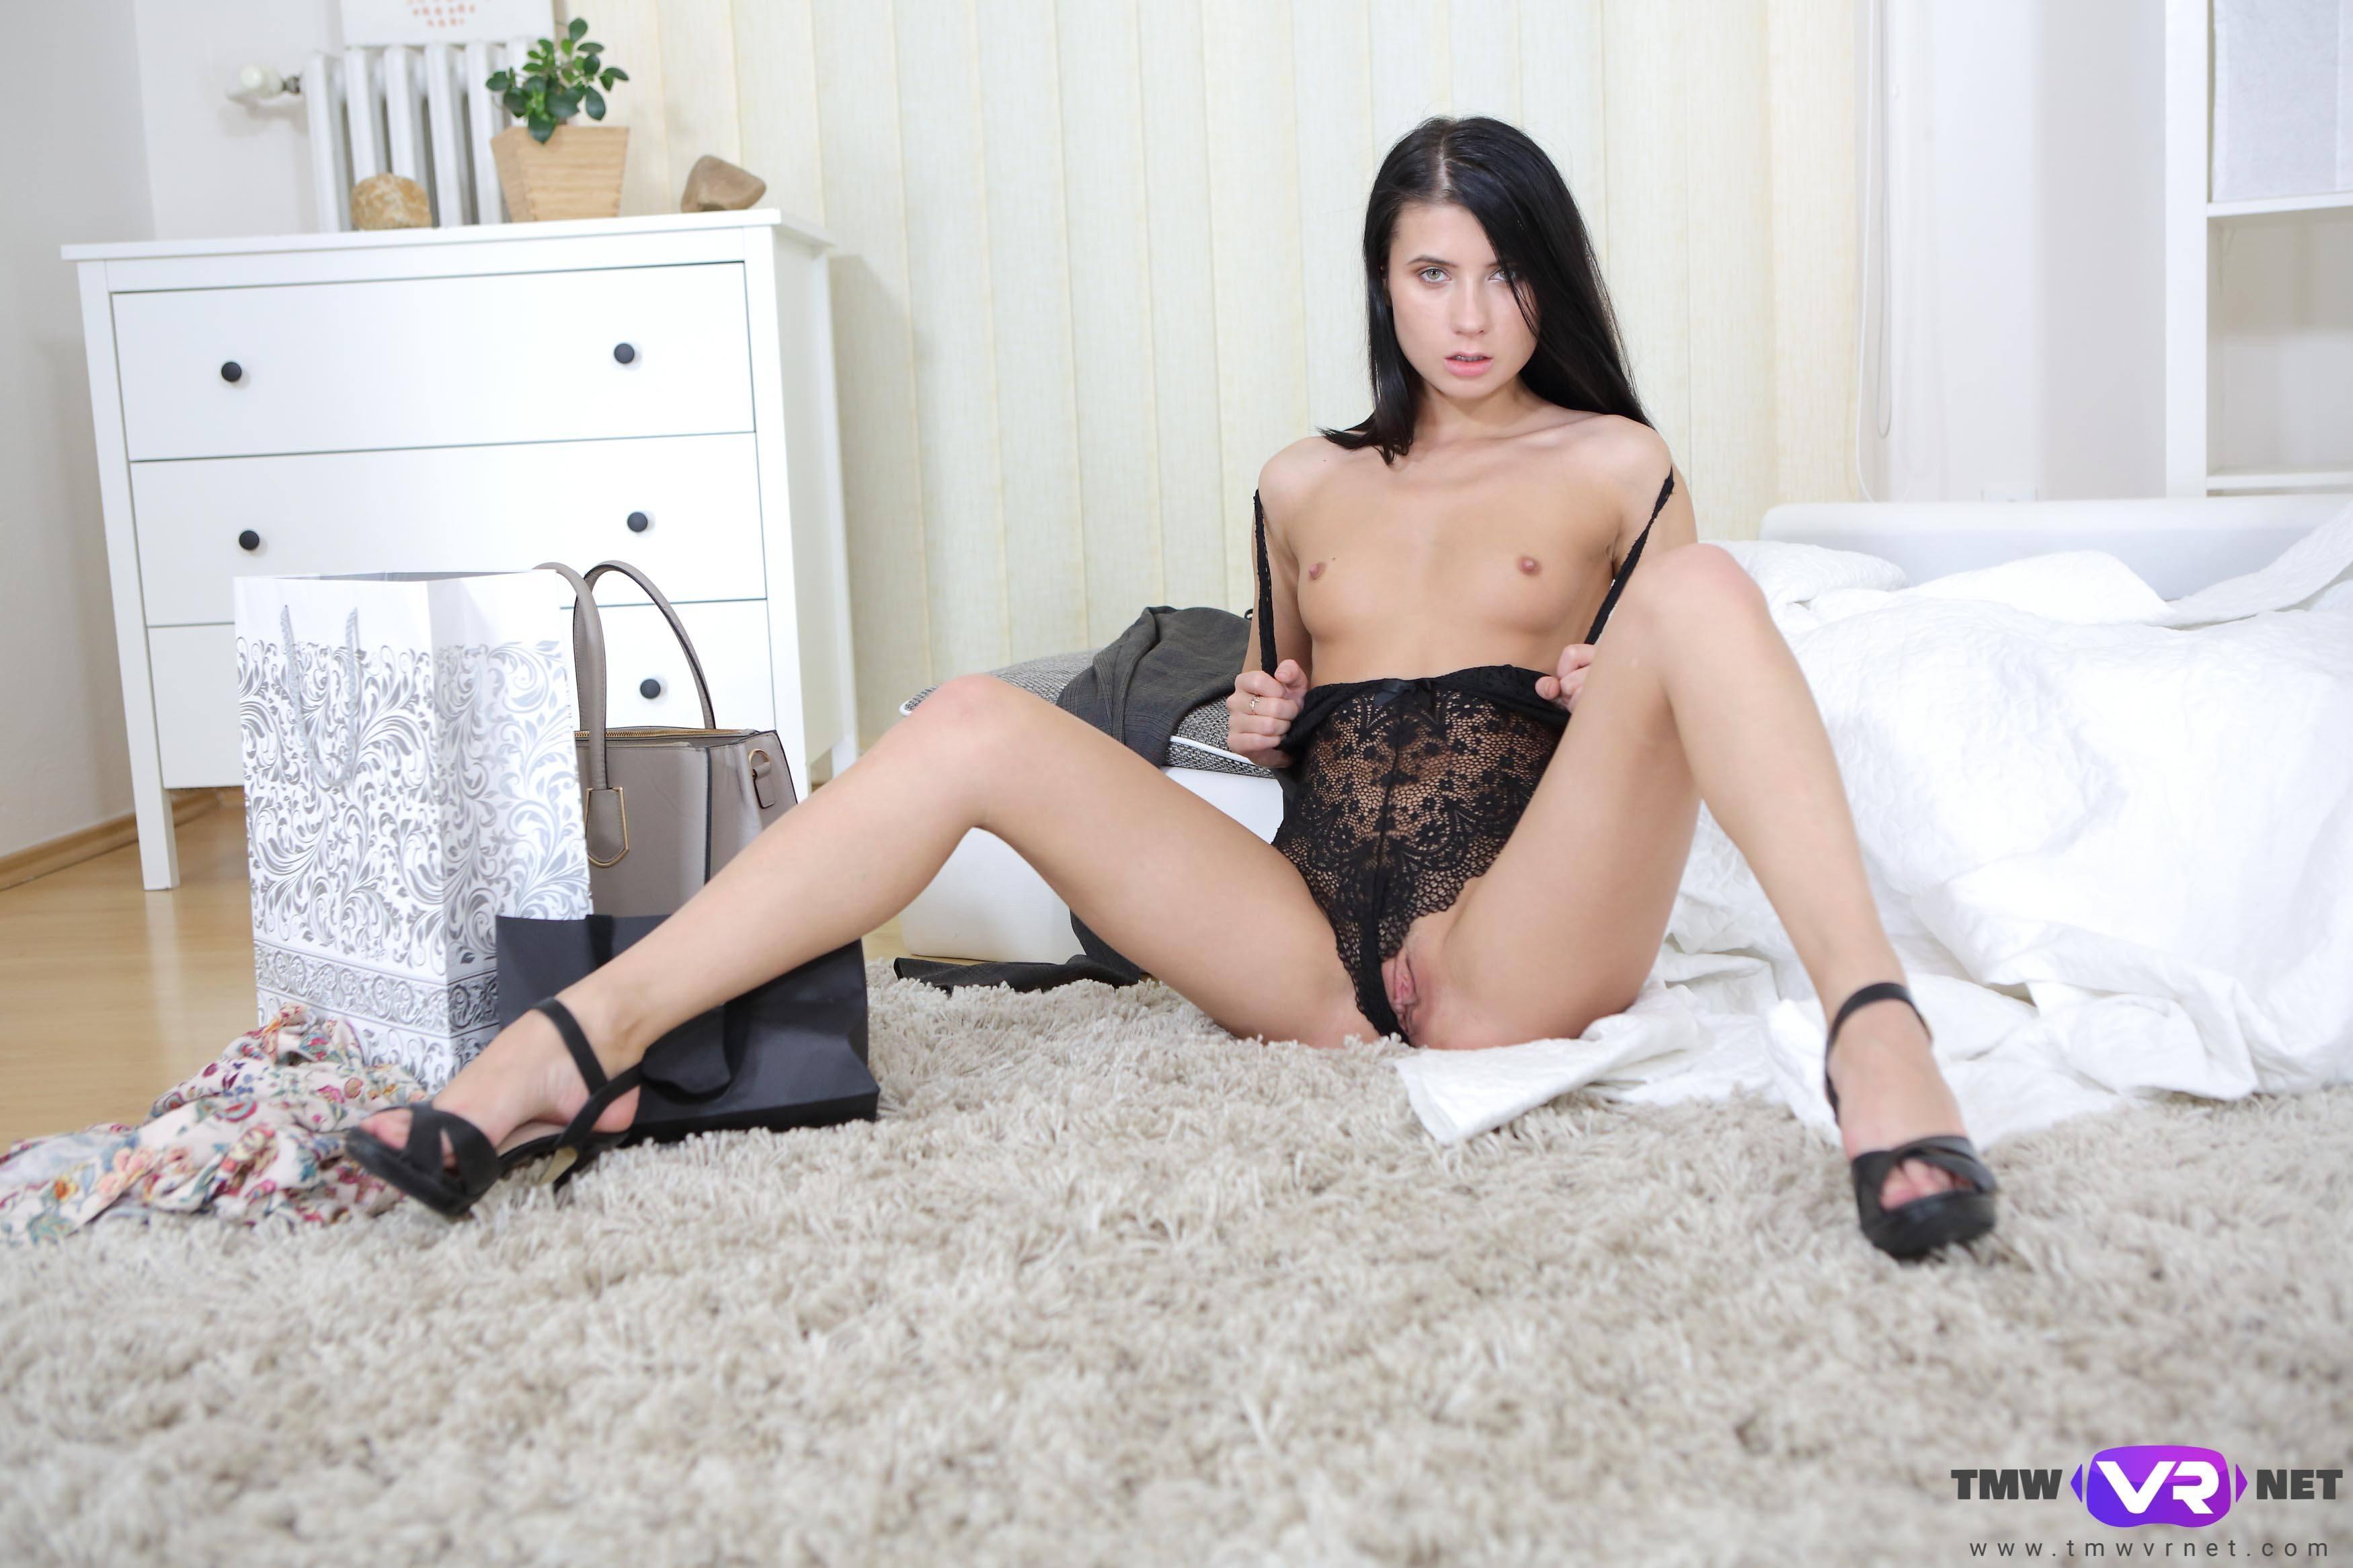 Naked asian babe geting massage sex